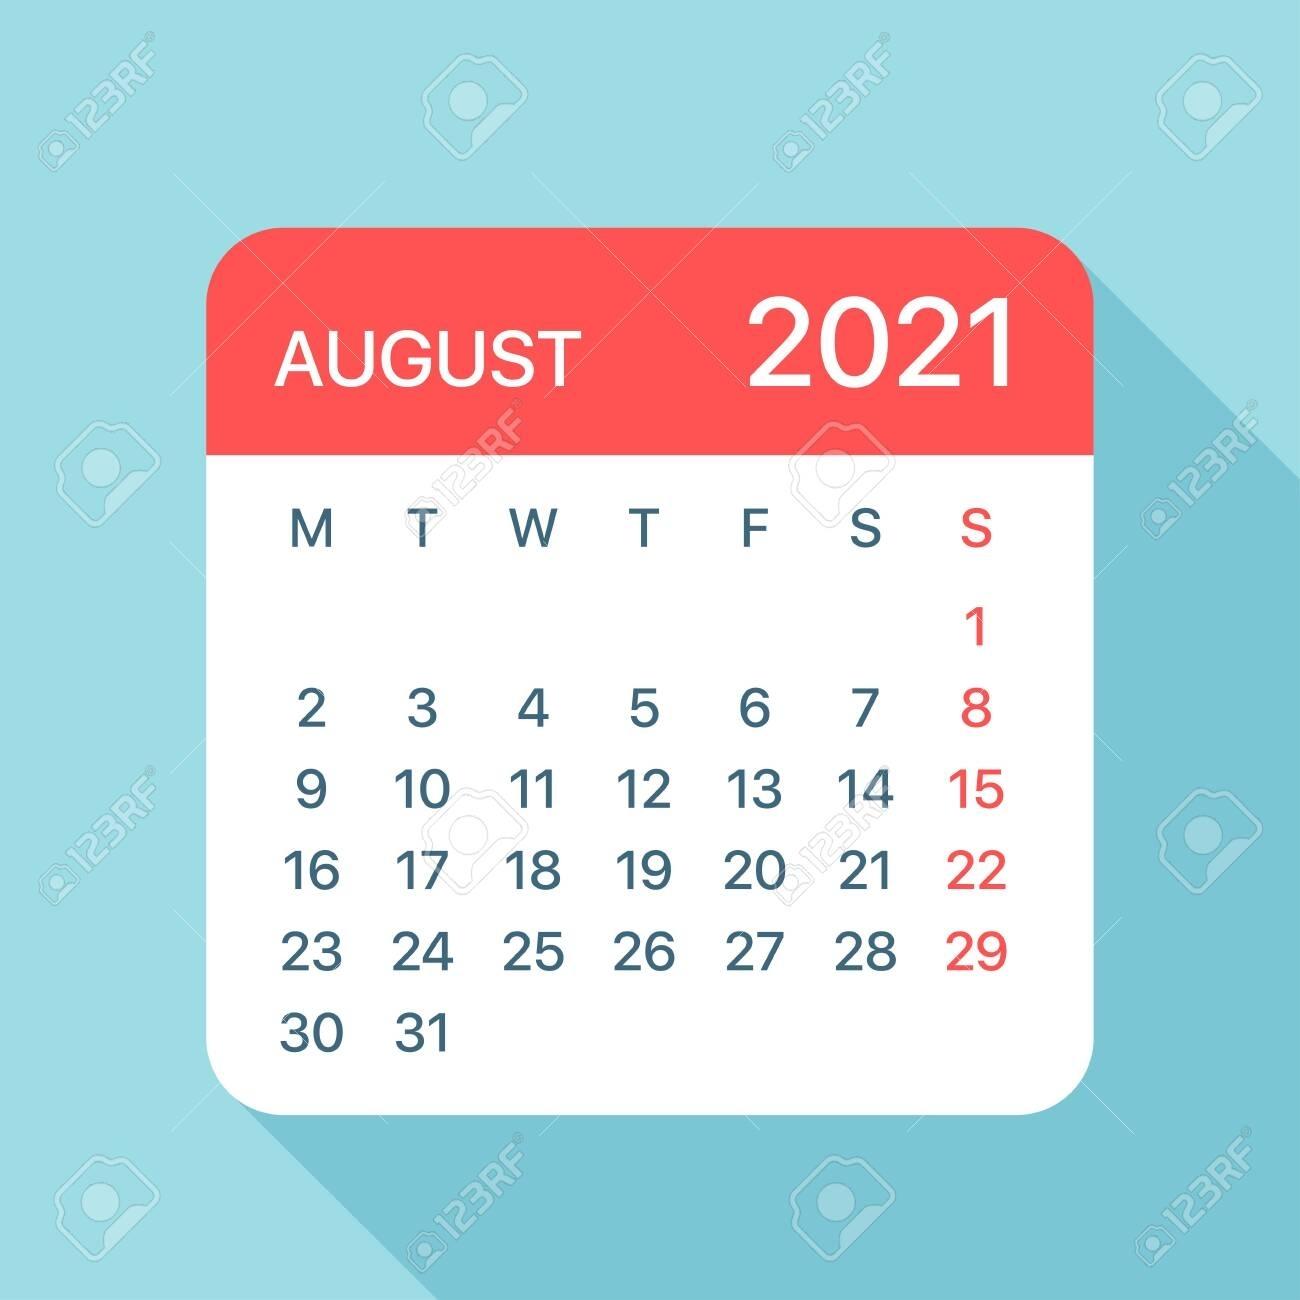 Pick August 2021 Clip Art